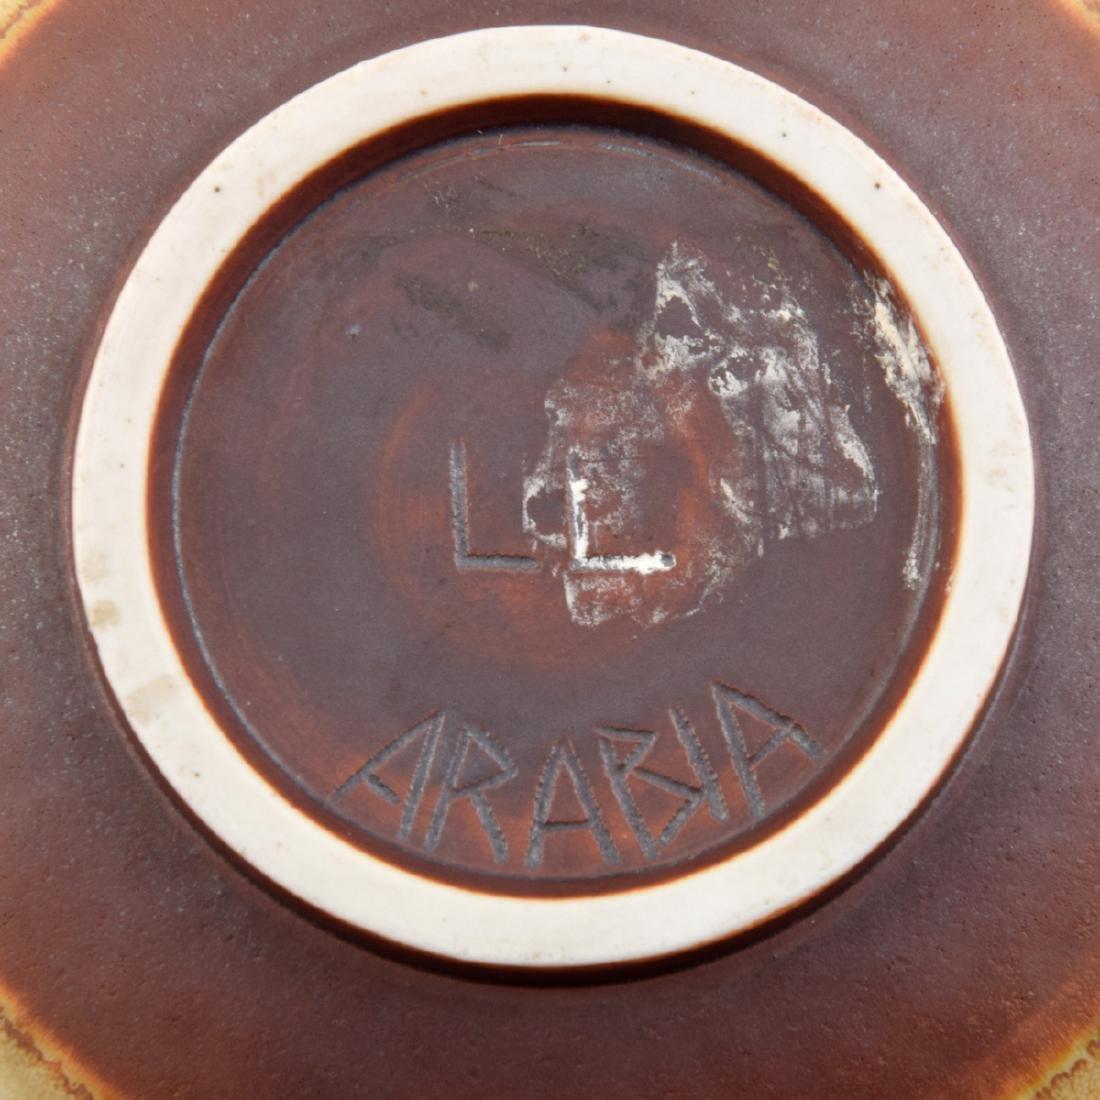 Liisa Hallamaa-Larsen Bowl - 6